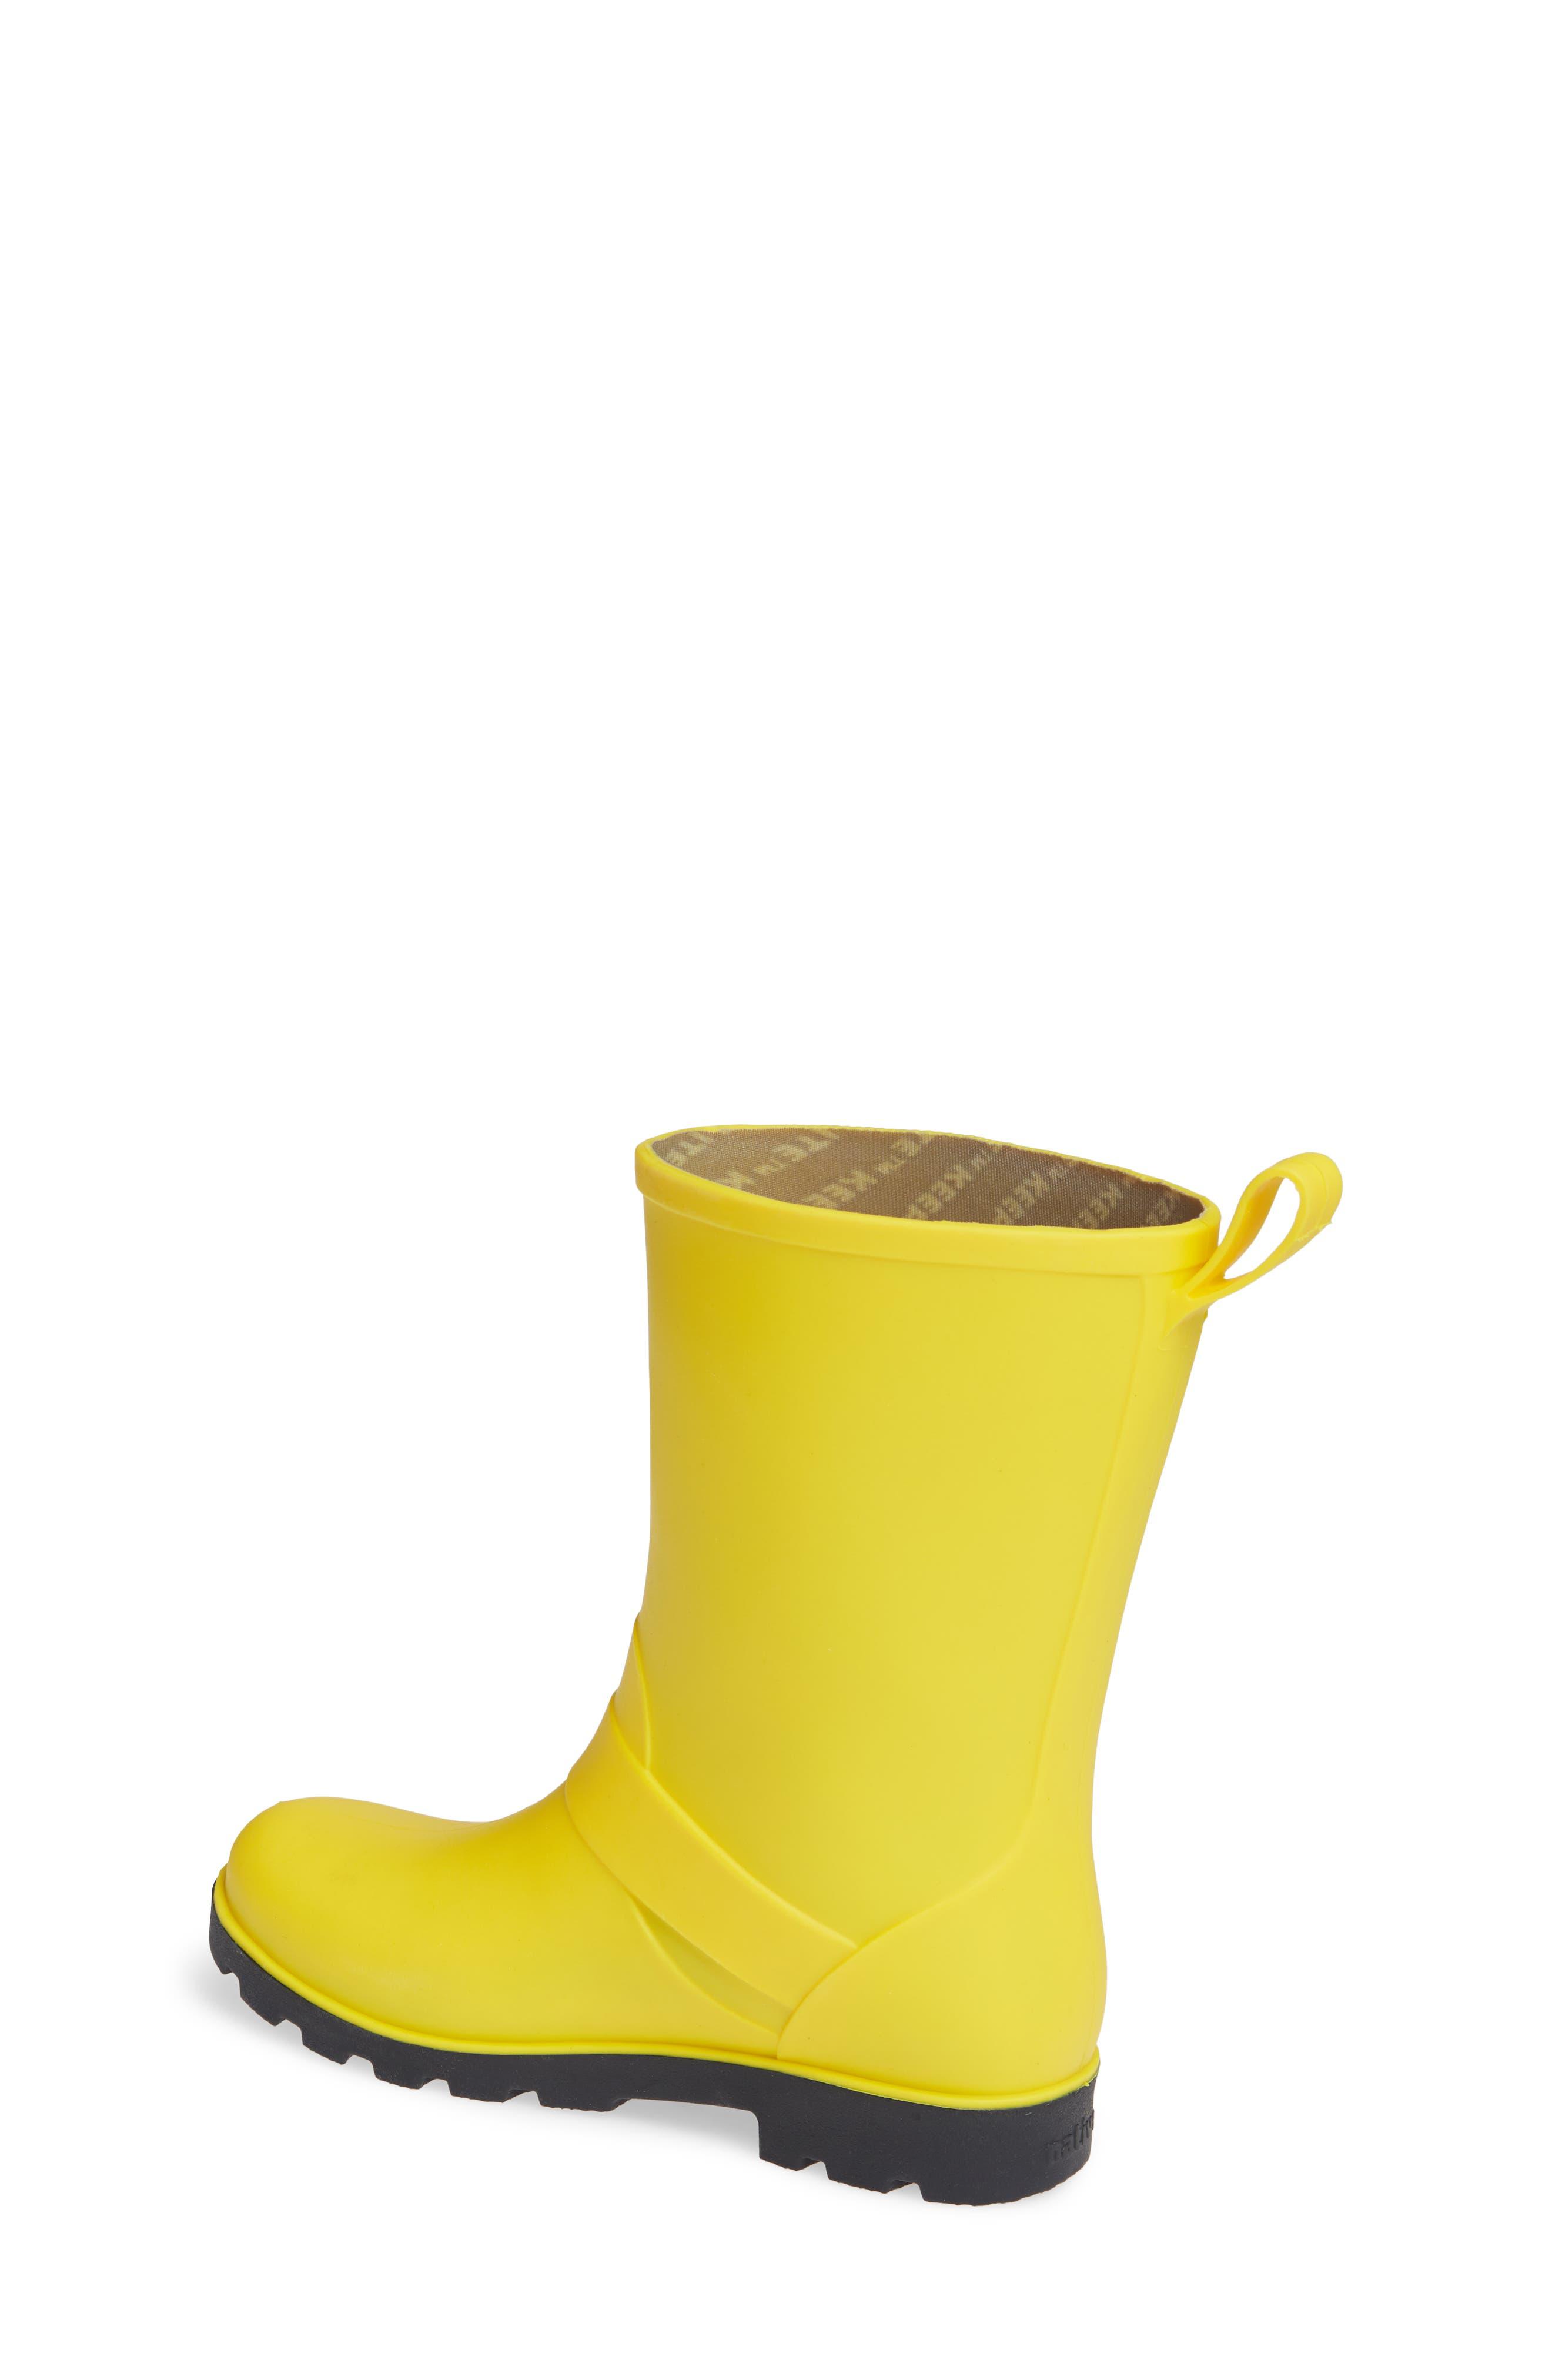 Native Barnett Rain Boot,                             Alternate thumbnail 2, color,                             CRAYON YELLOW/ JIFFY BLACK